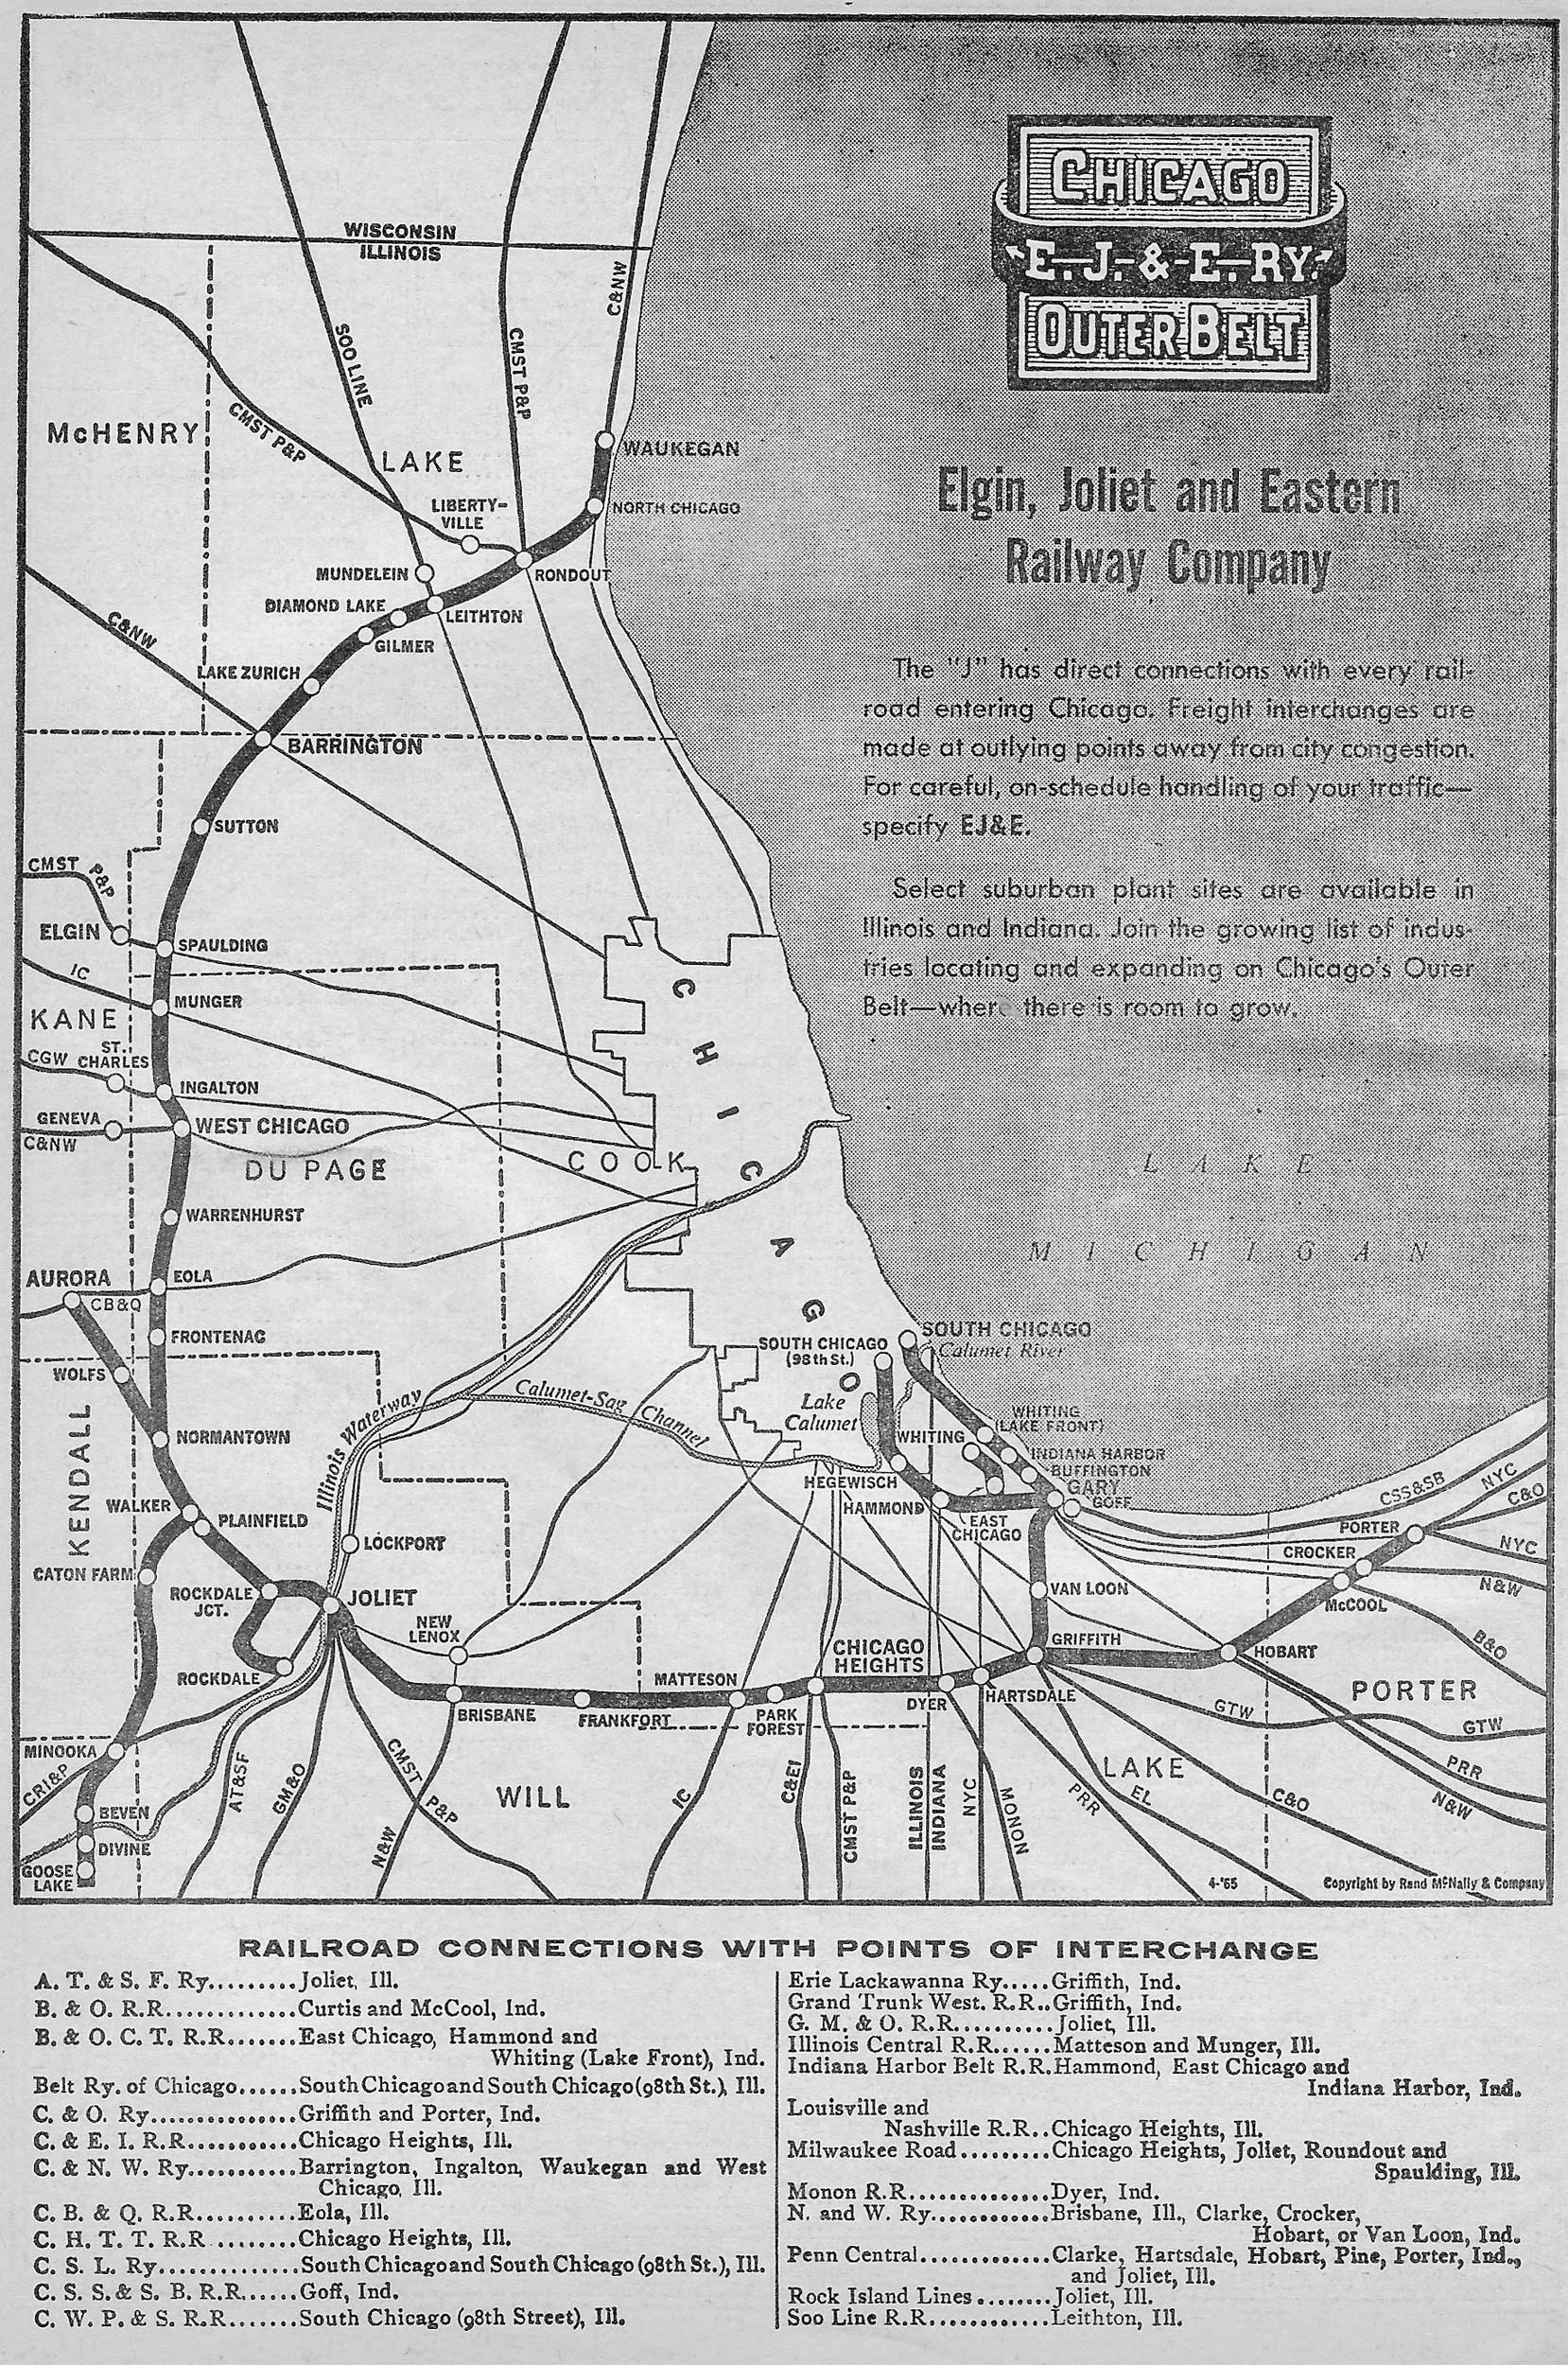 The Elgin Joliet and Eastern Railway